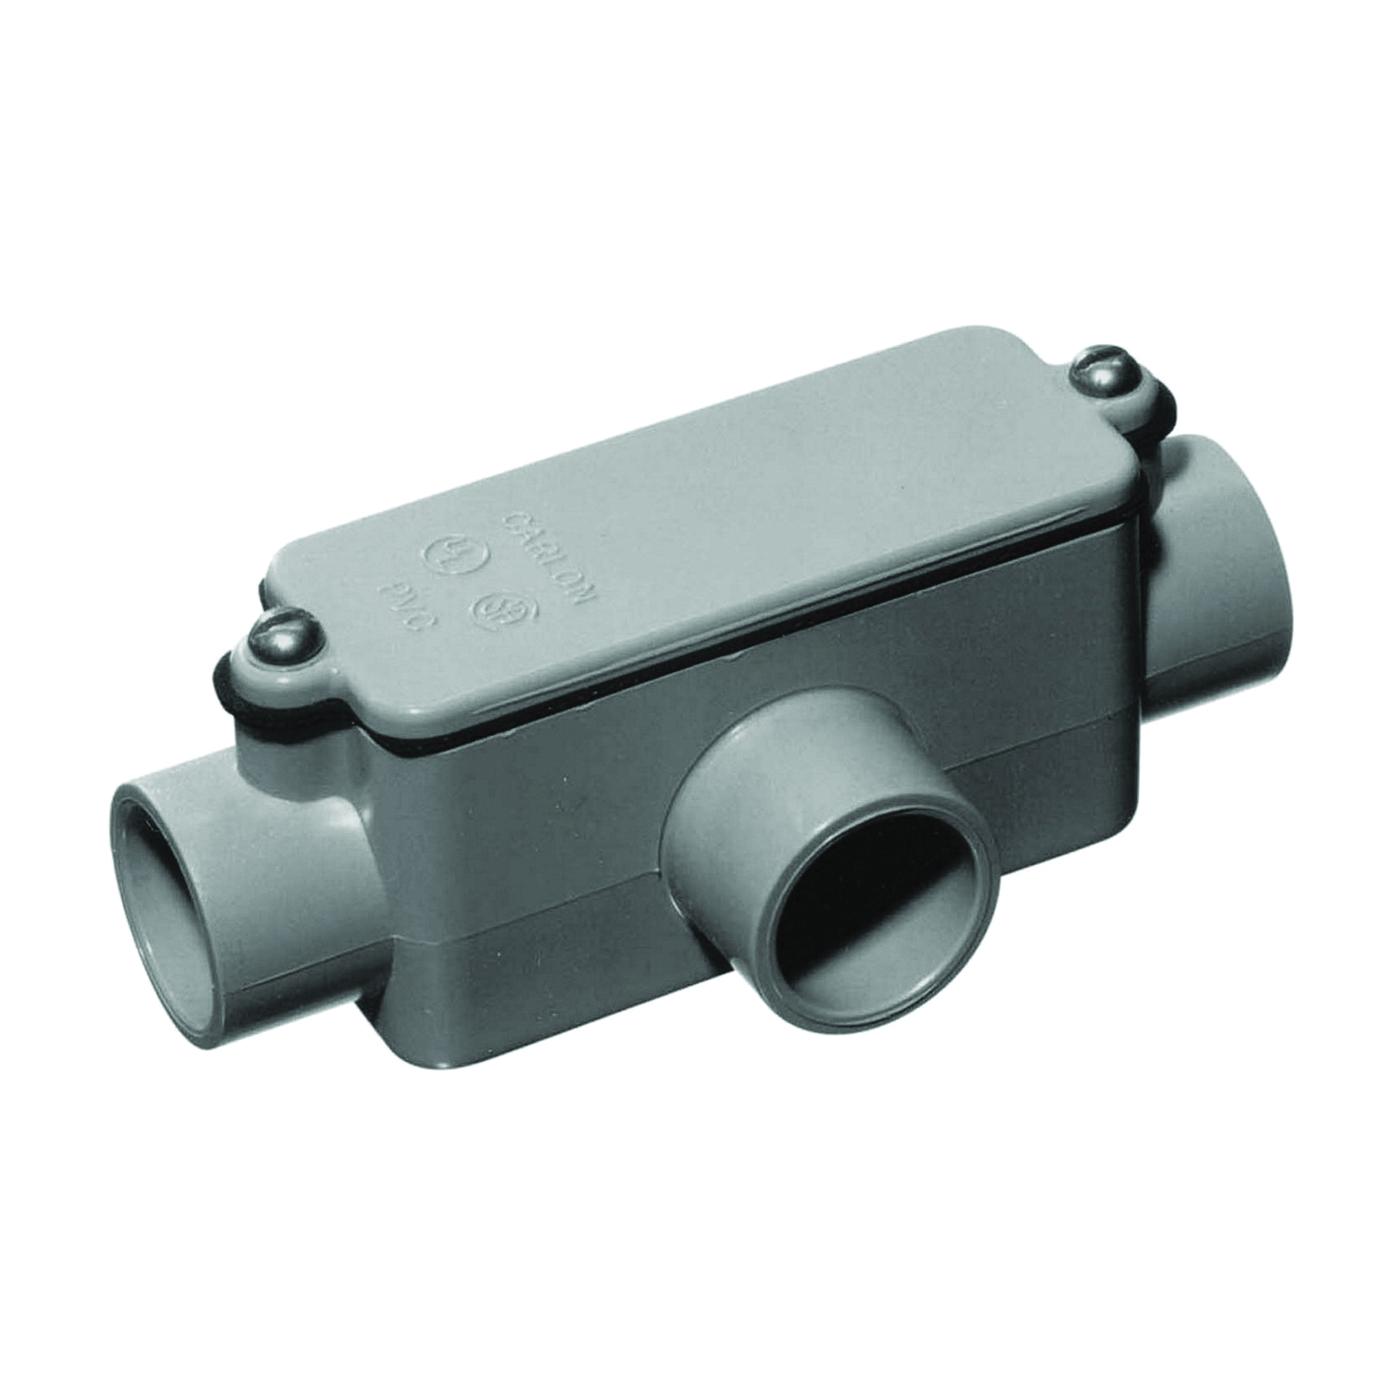 Picture of Carlon E983D-CTN Conduit Body, PVC, Gray